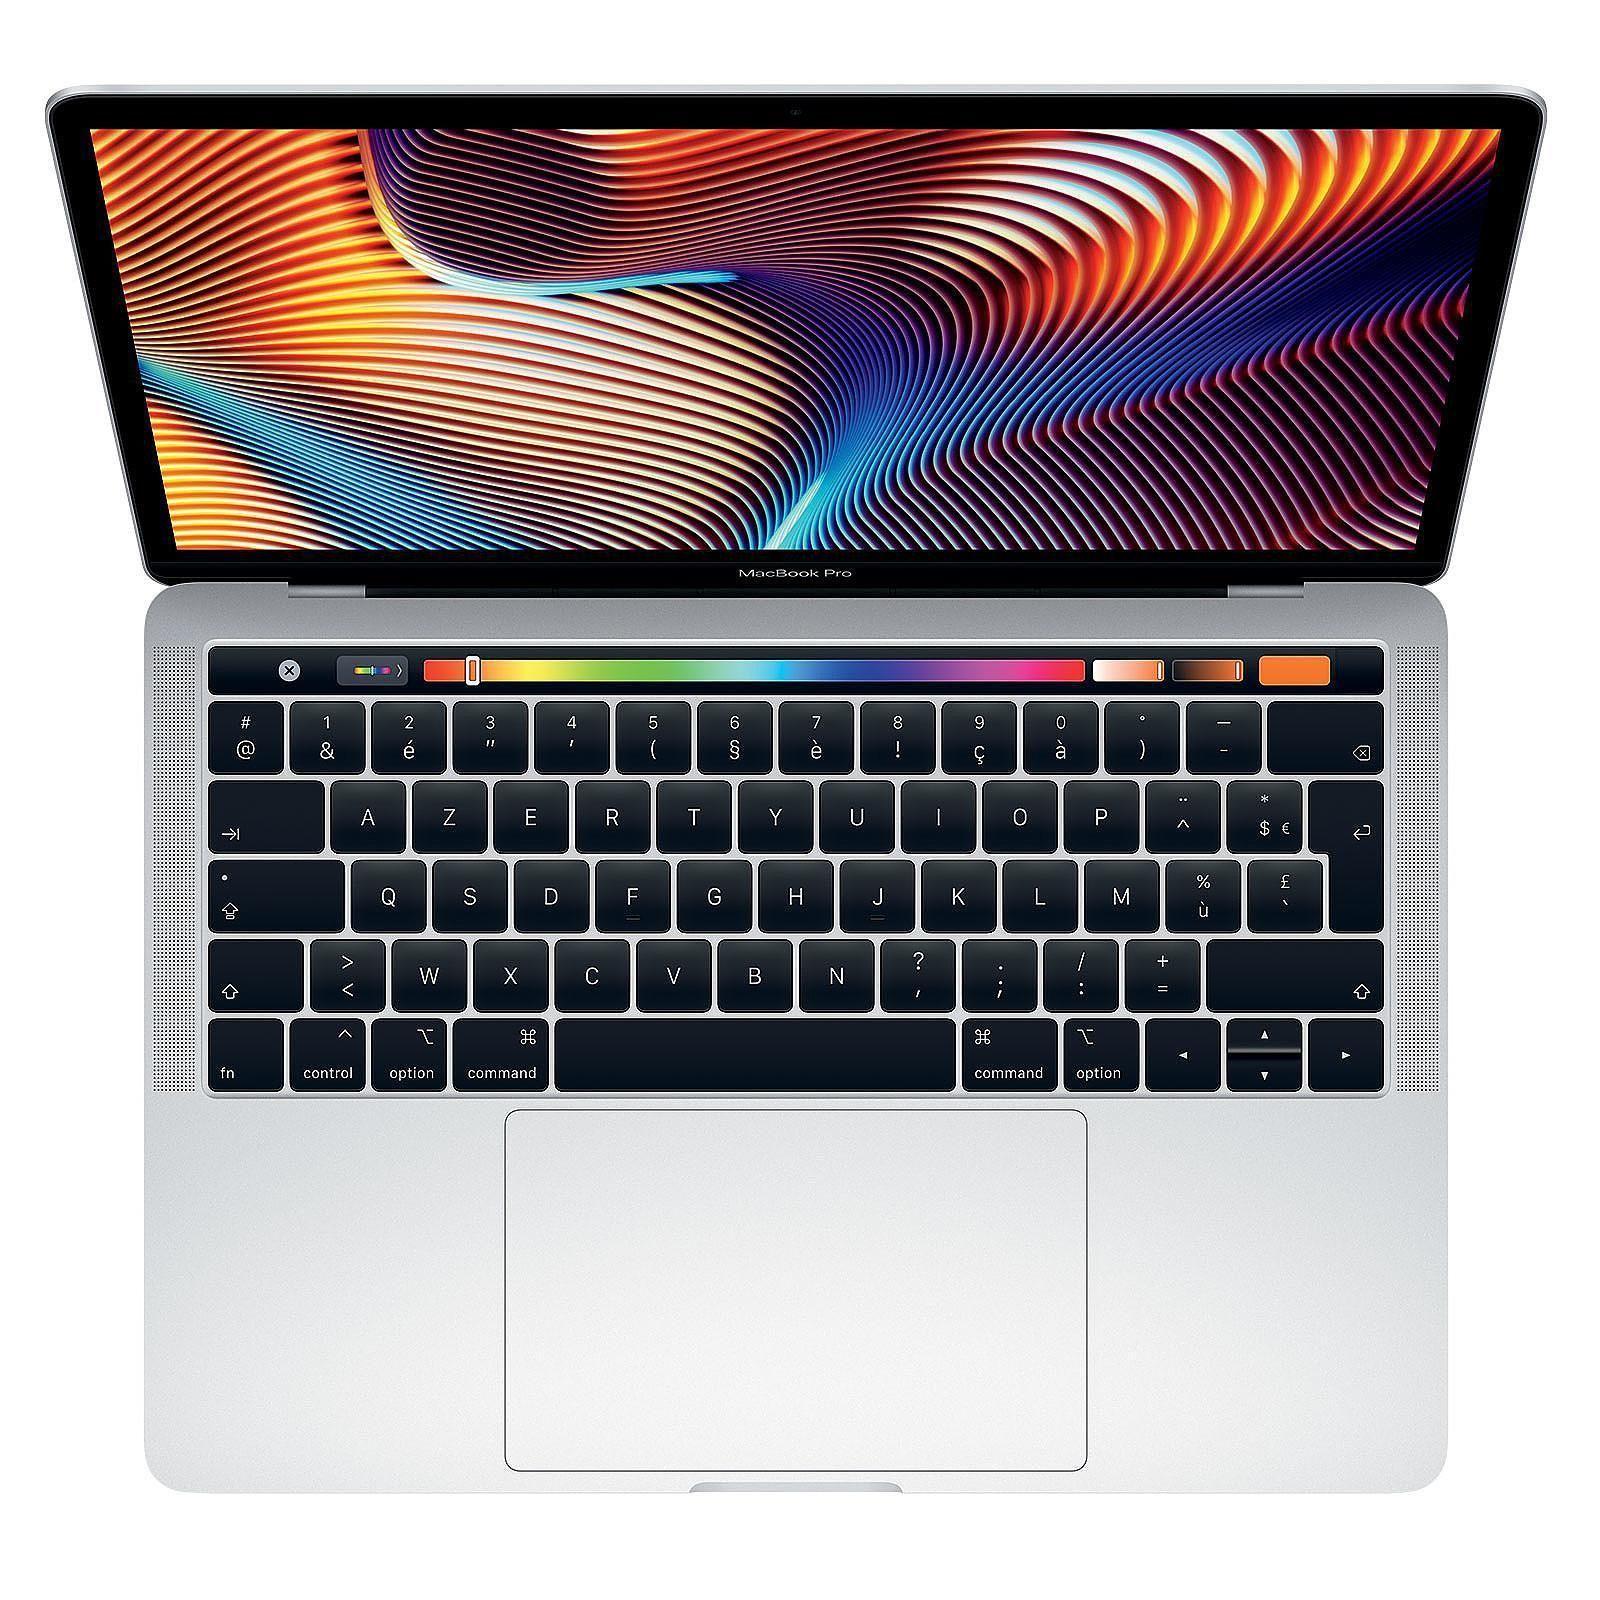 Macbook Pro 13 July 2019 Core I5 Ram 8gb Ssd 2 Tb Refurbished In 2020 Macbook Pro 13 Inch Macbook Pro Retina Macbook Pro